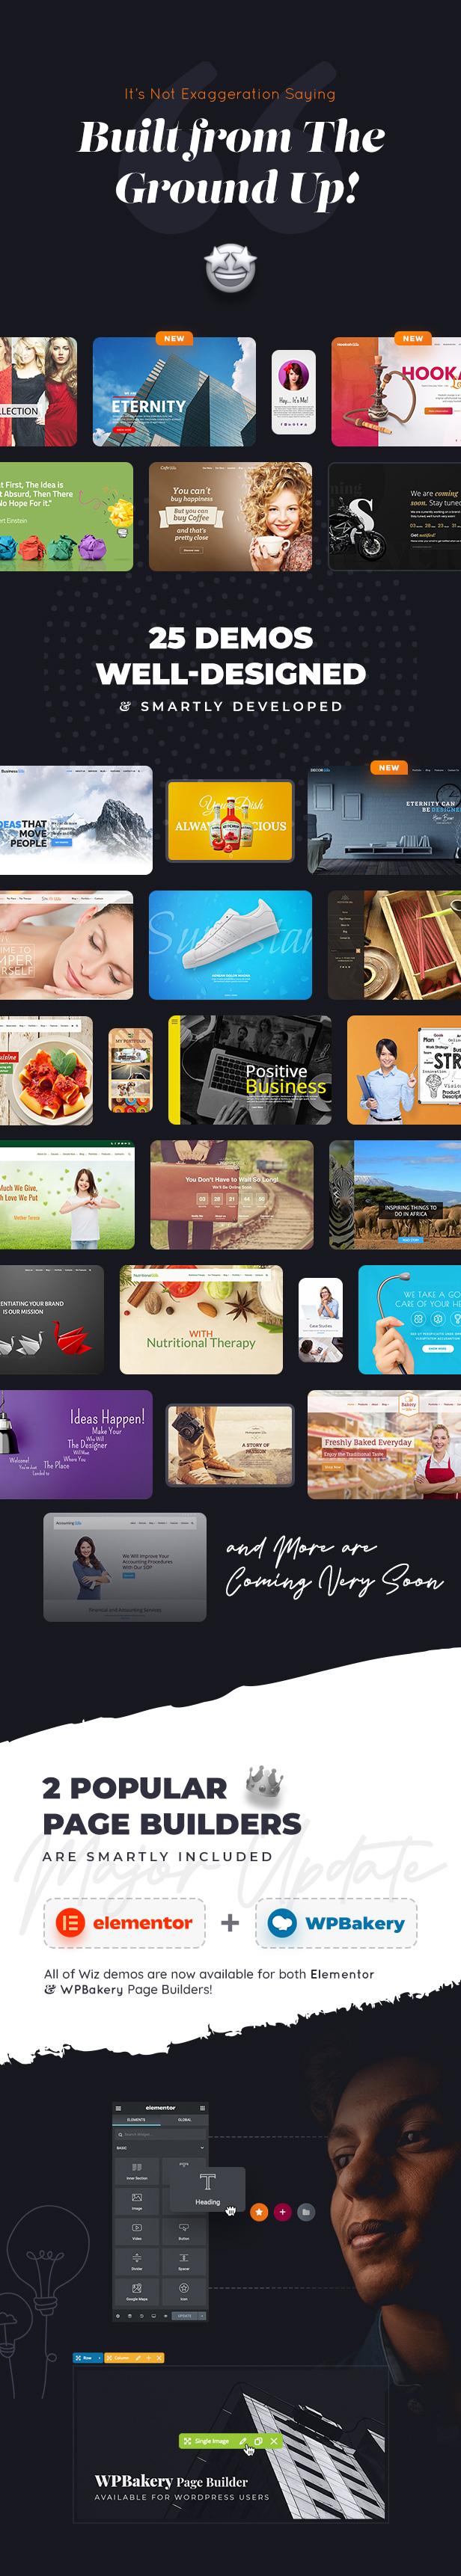 wiz demos built from the ground up - Wiz - Elementor MultiPurpose WordPress Theme